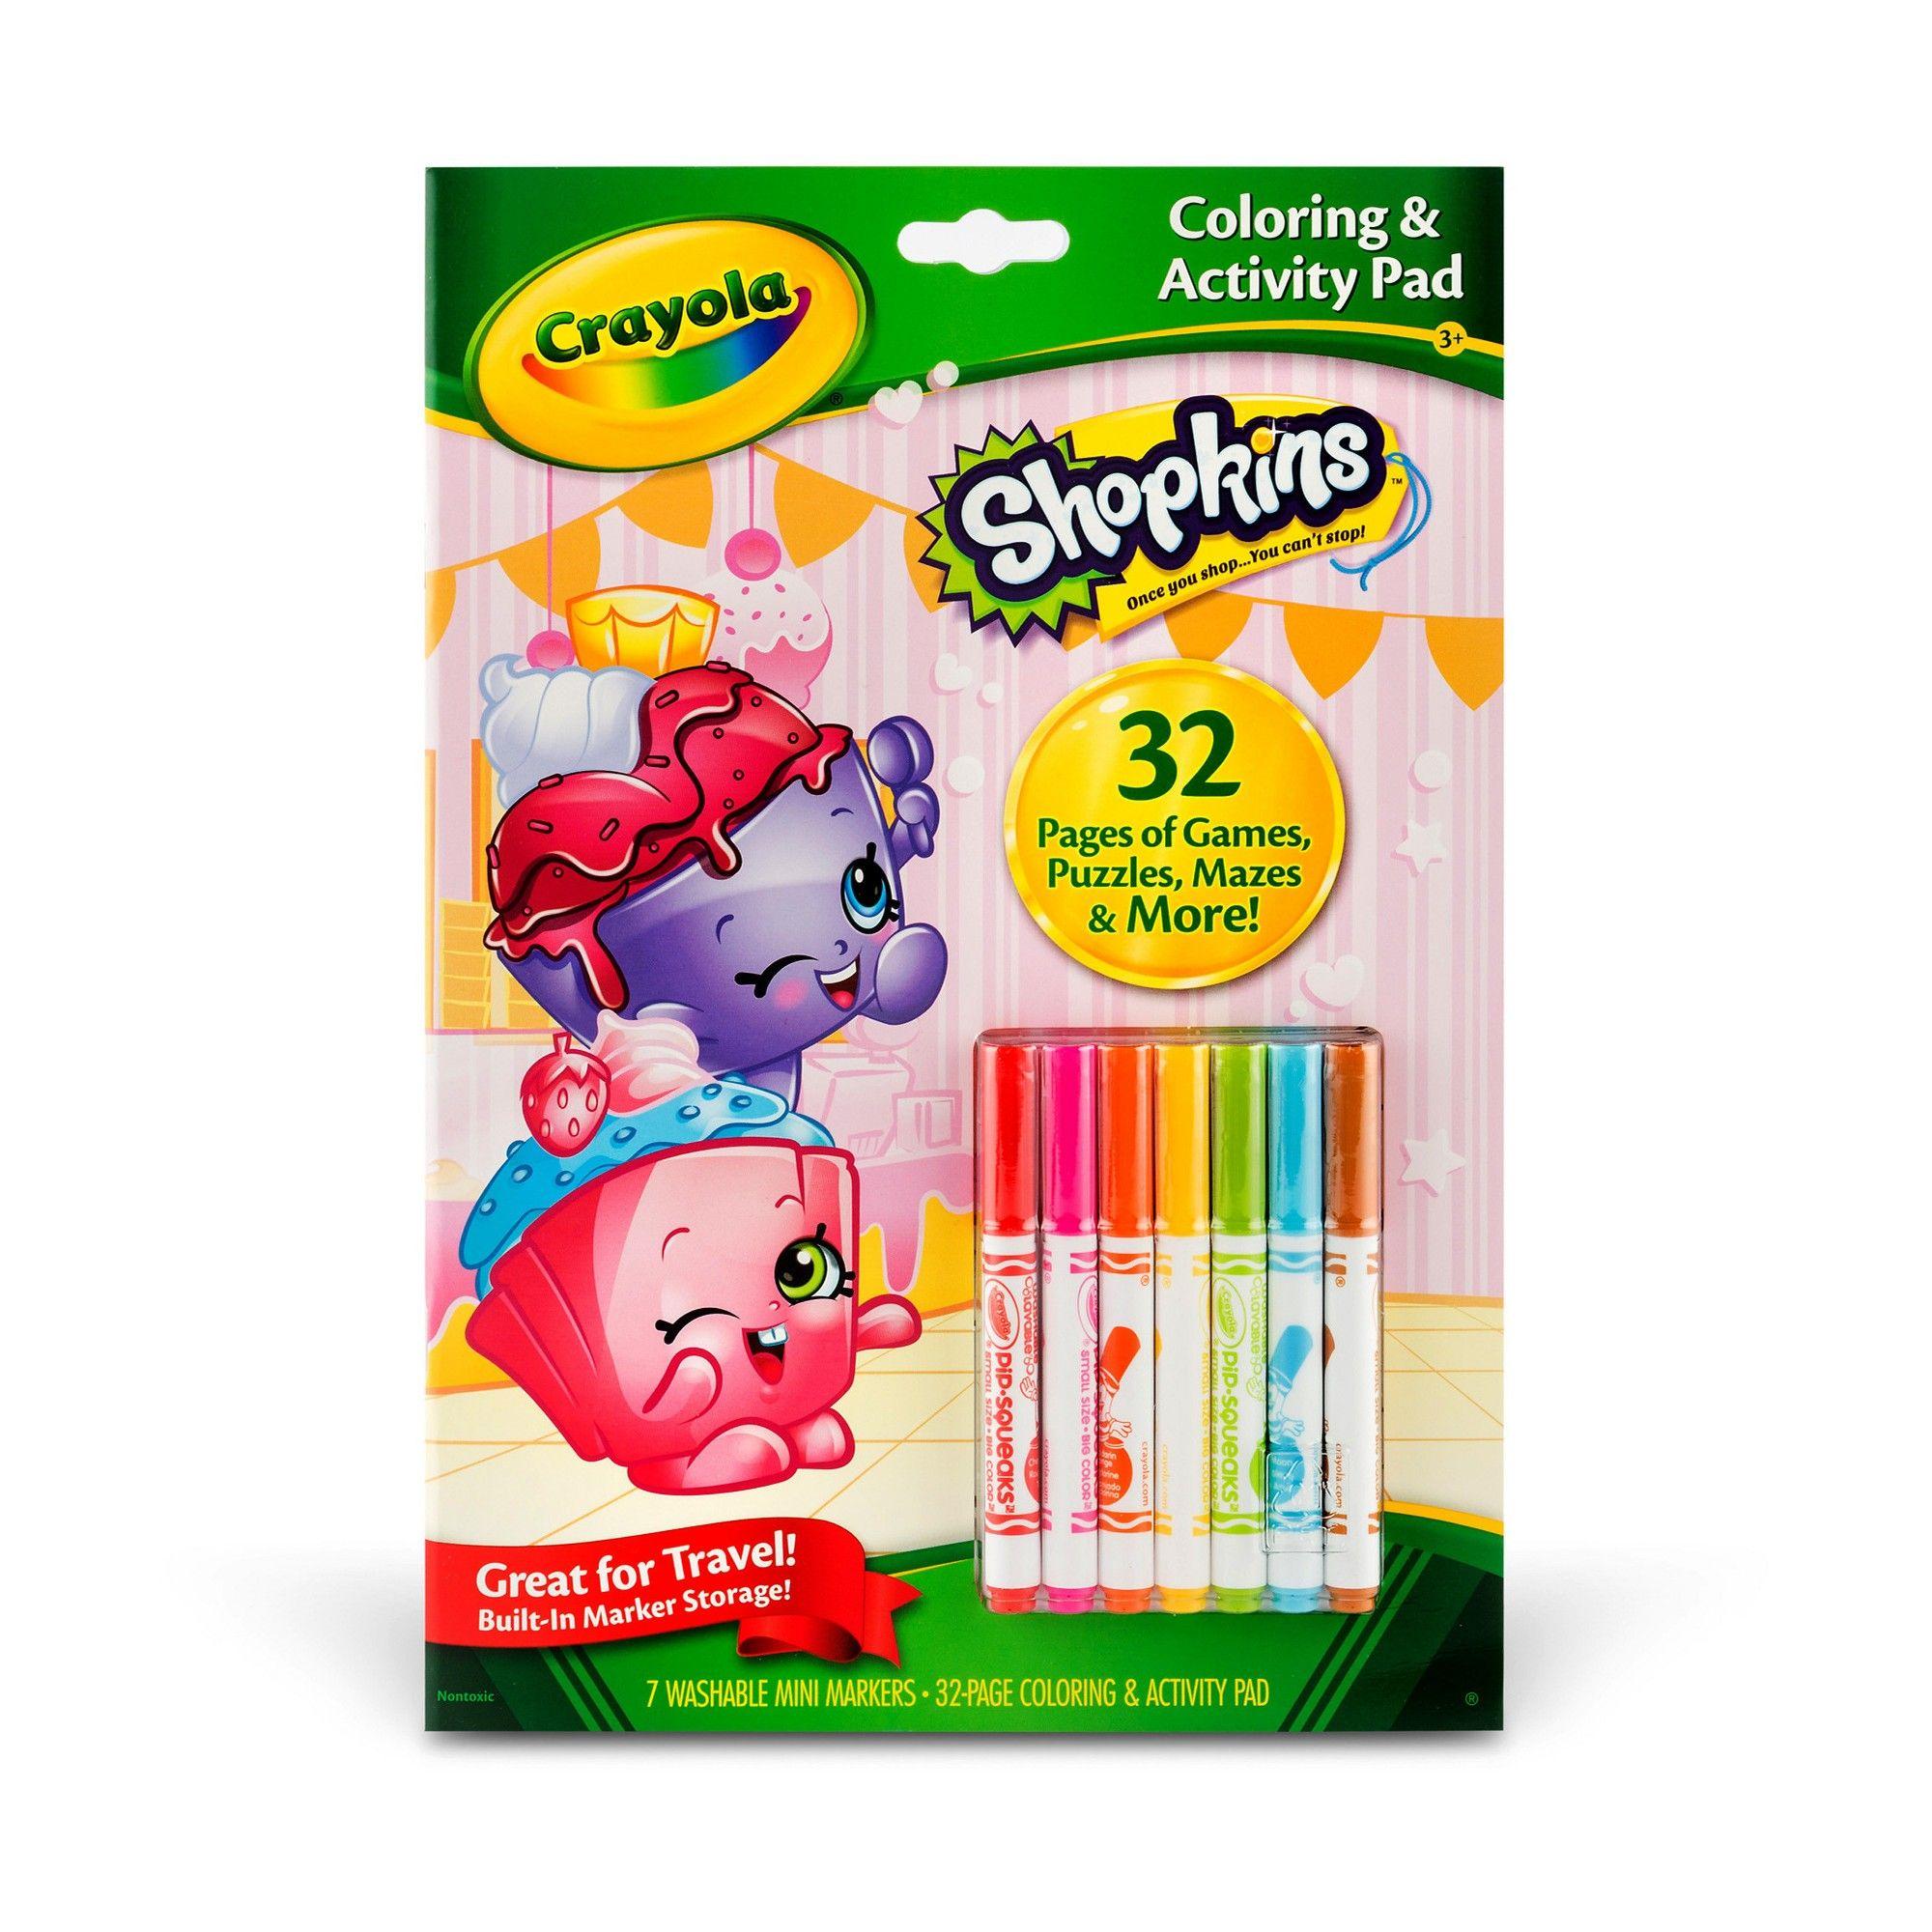 Coloring Books Crayola Multicolor Multi Colored Crayola Shopkins Coloring Stickers